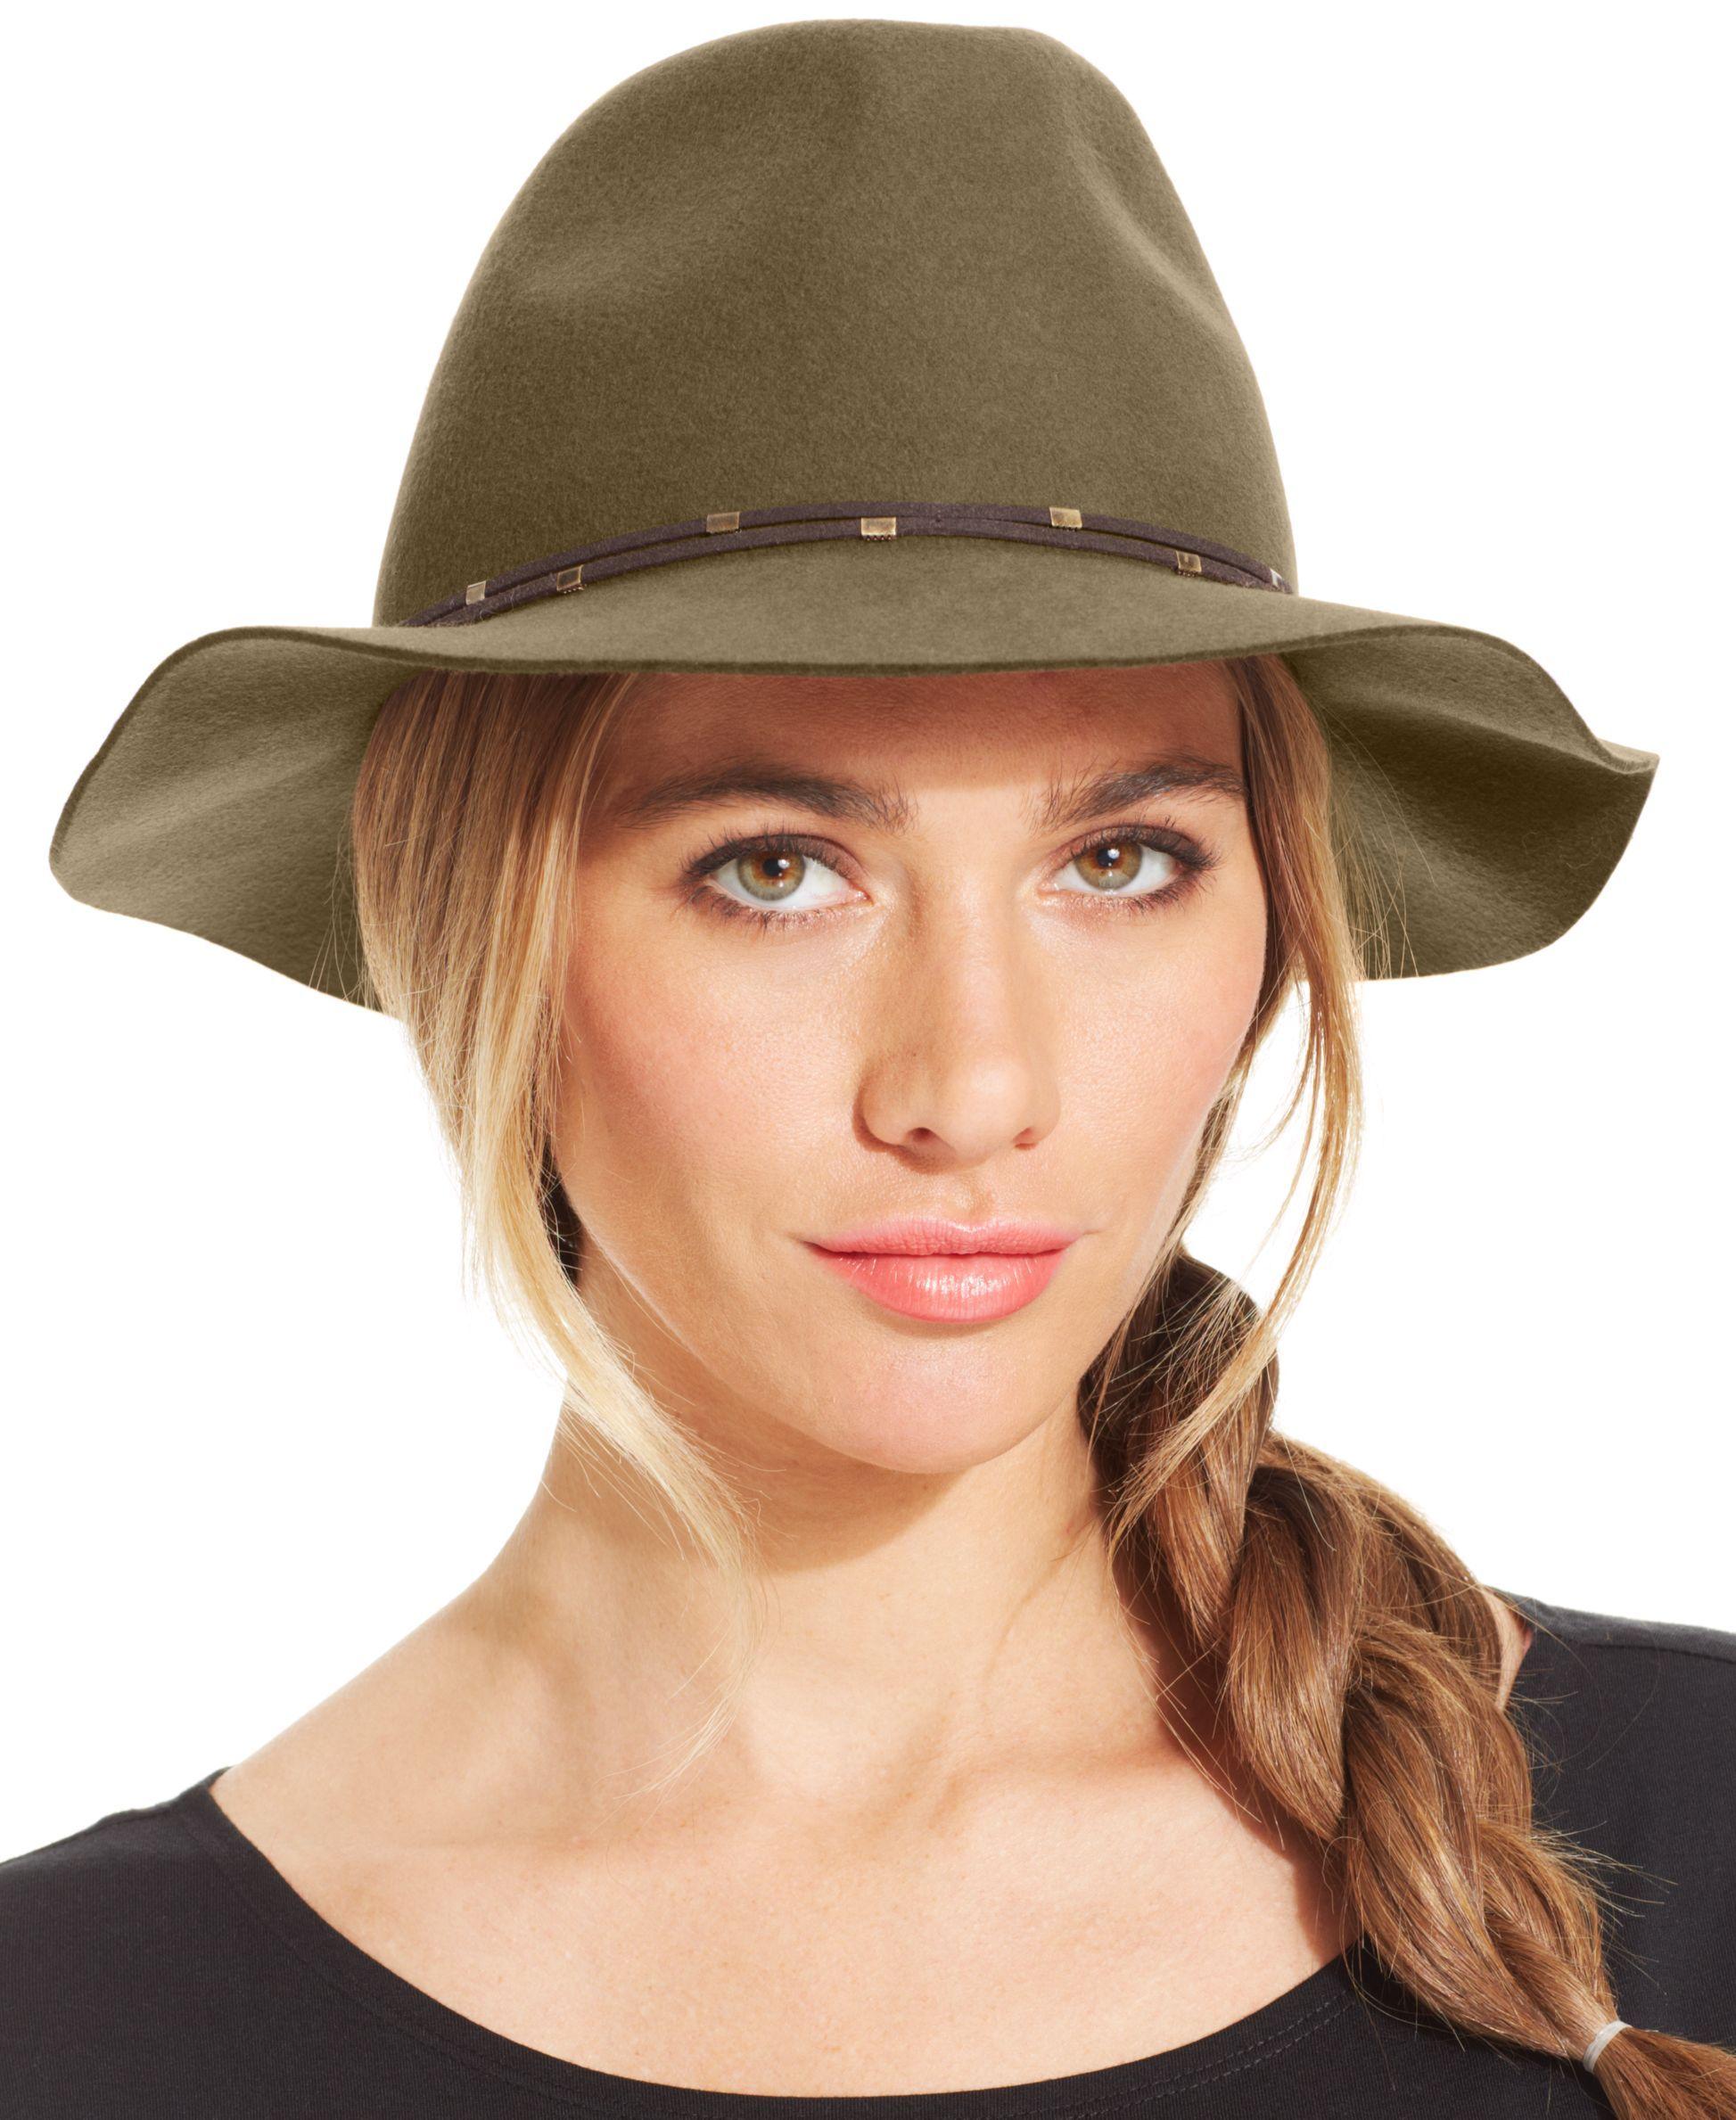 b04ff108 Nine West Pale Felt Rancher Hat | Products | Hats, Handbag ...